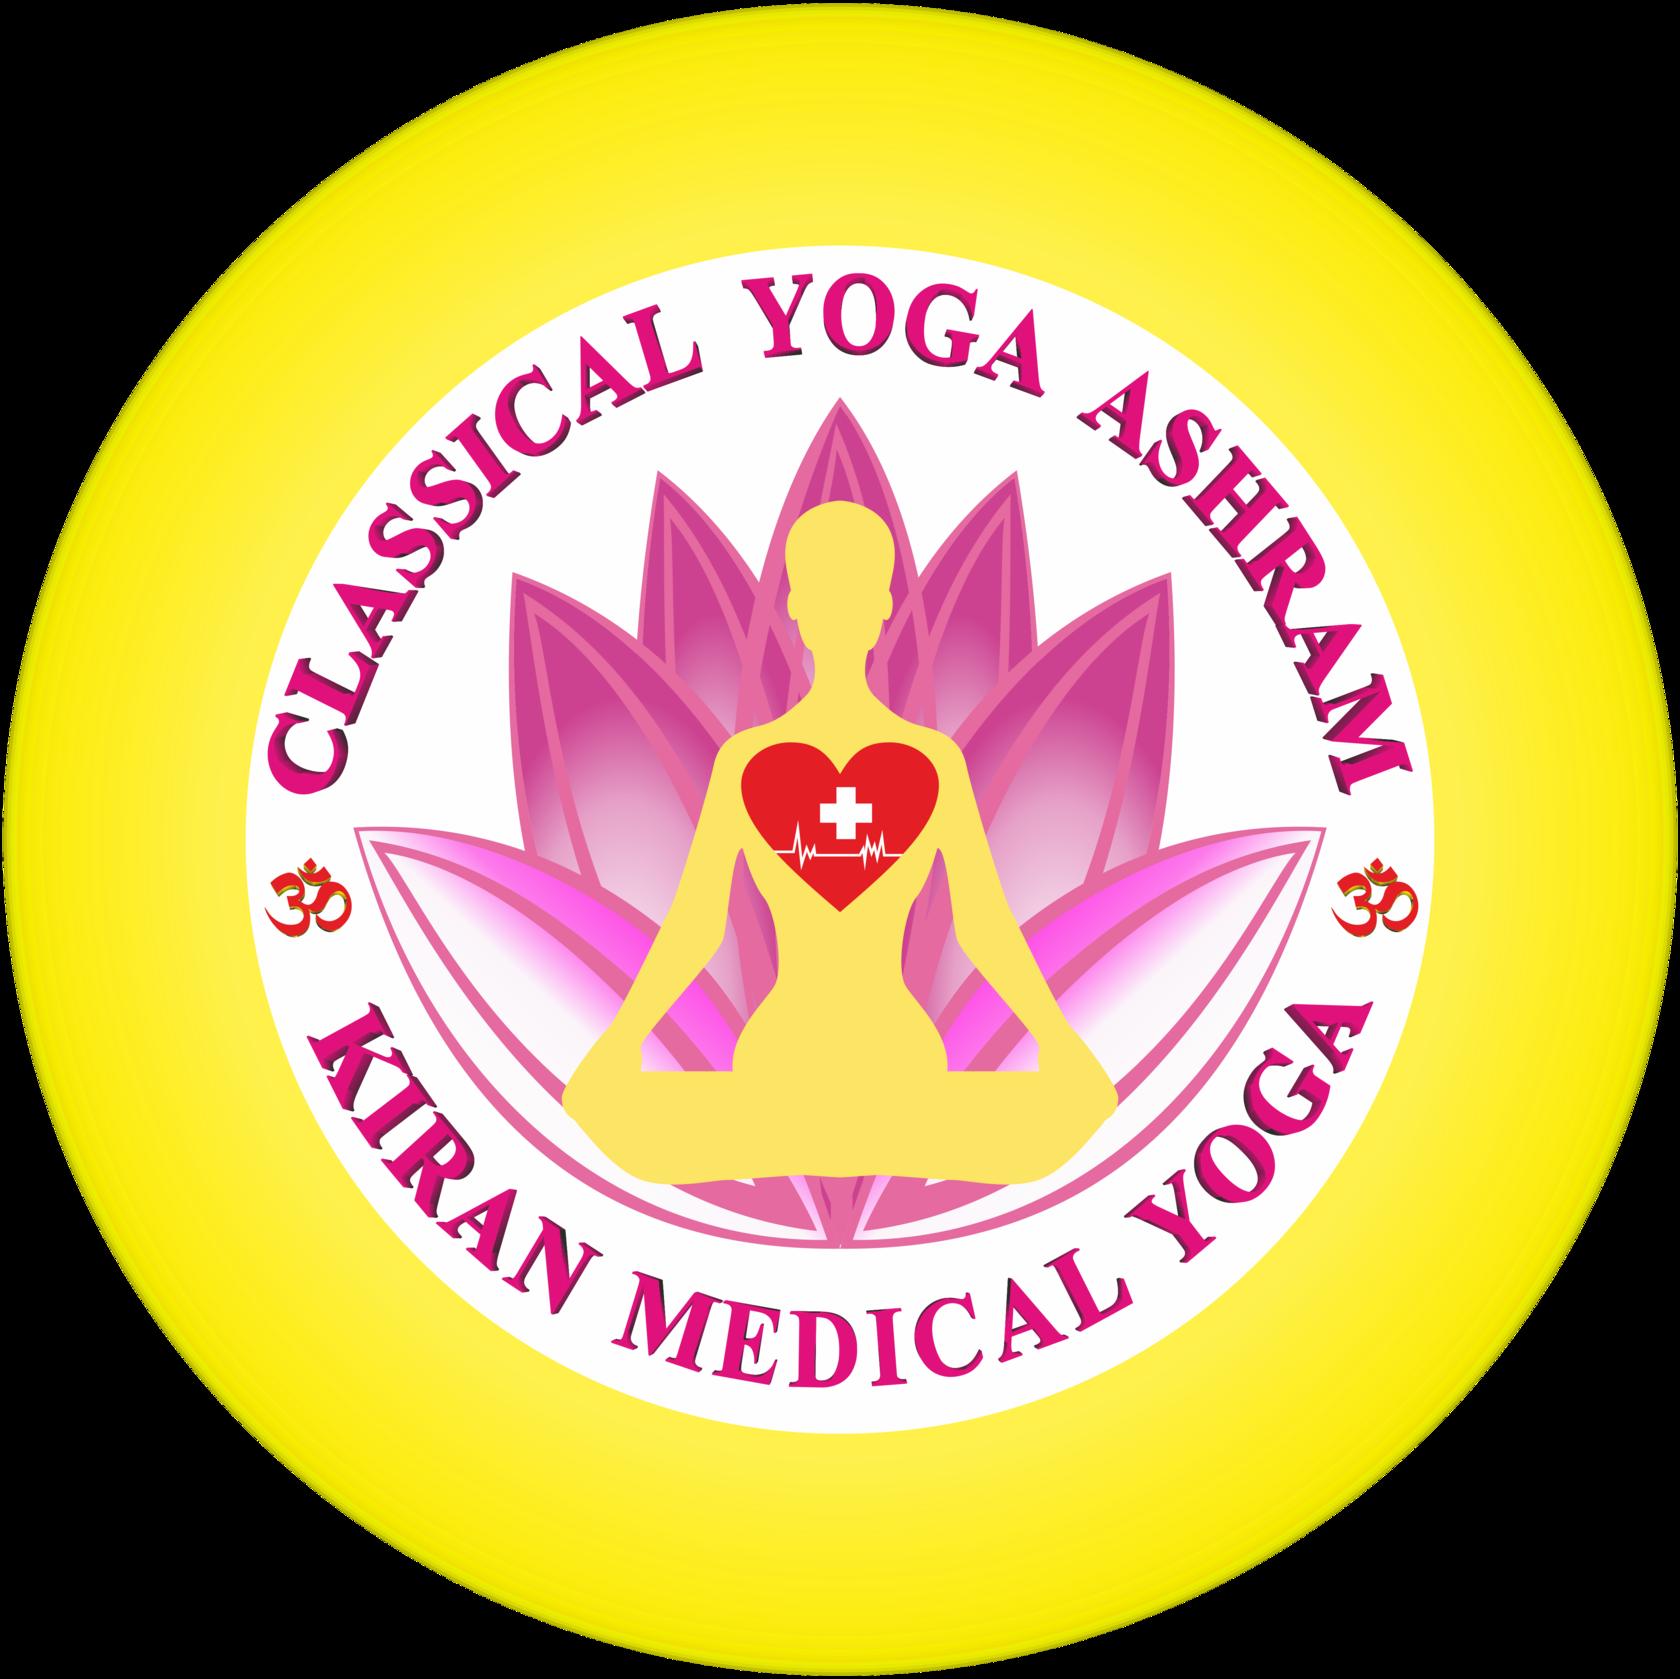 Classical Yoga Ashram